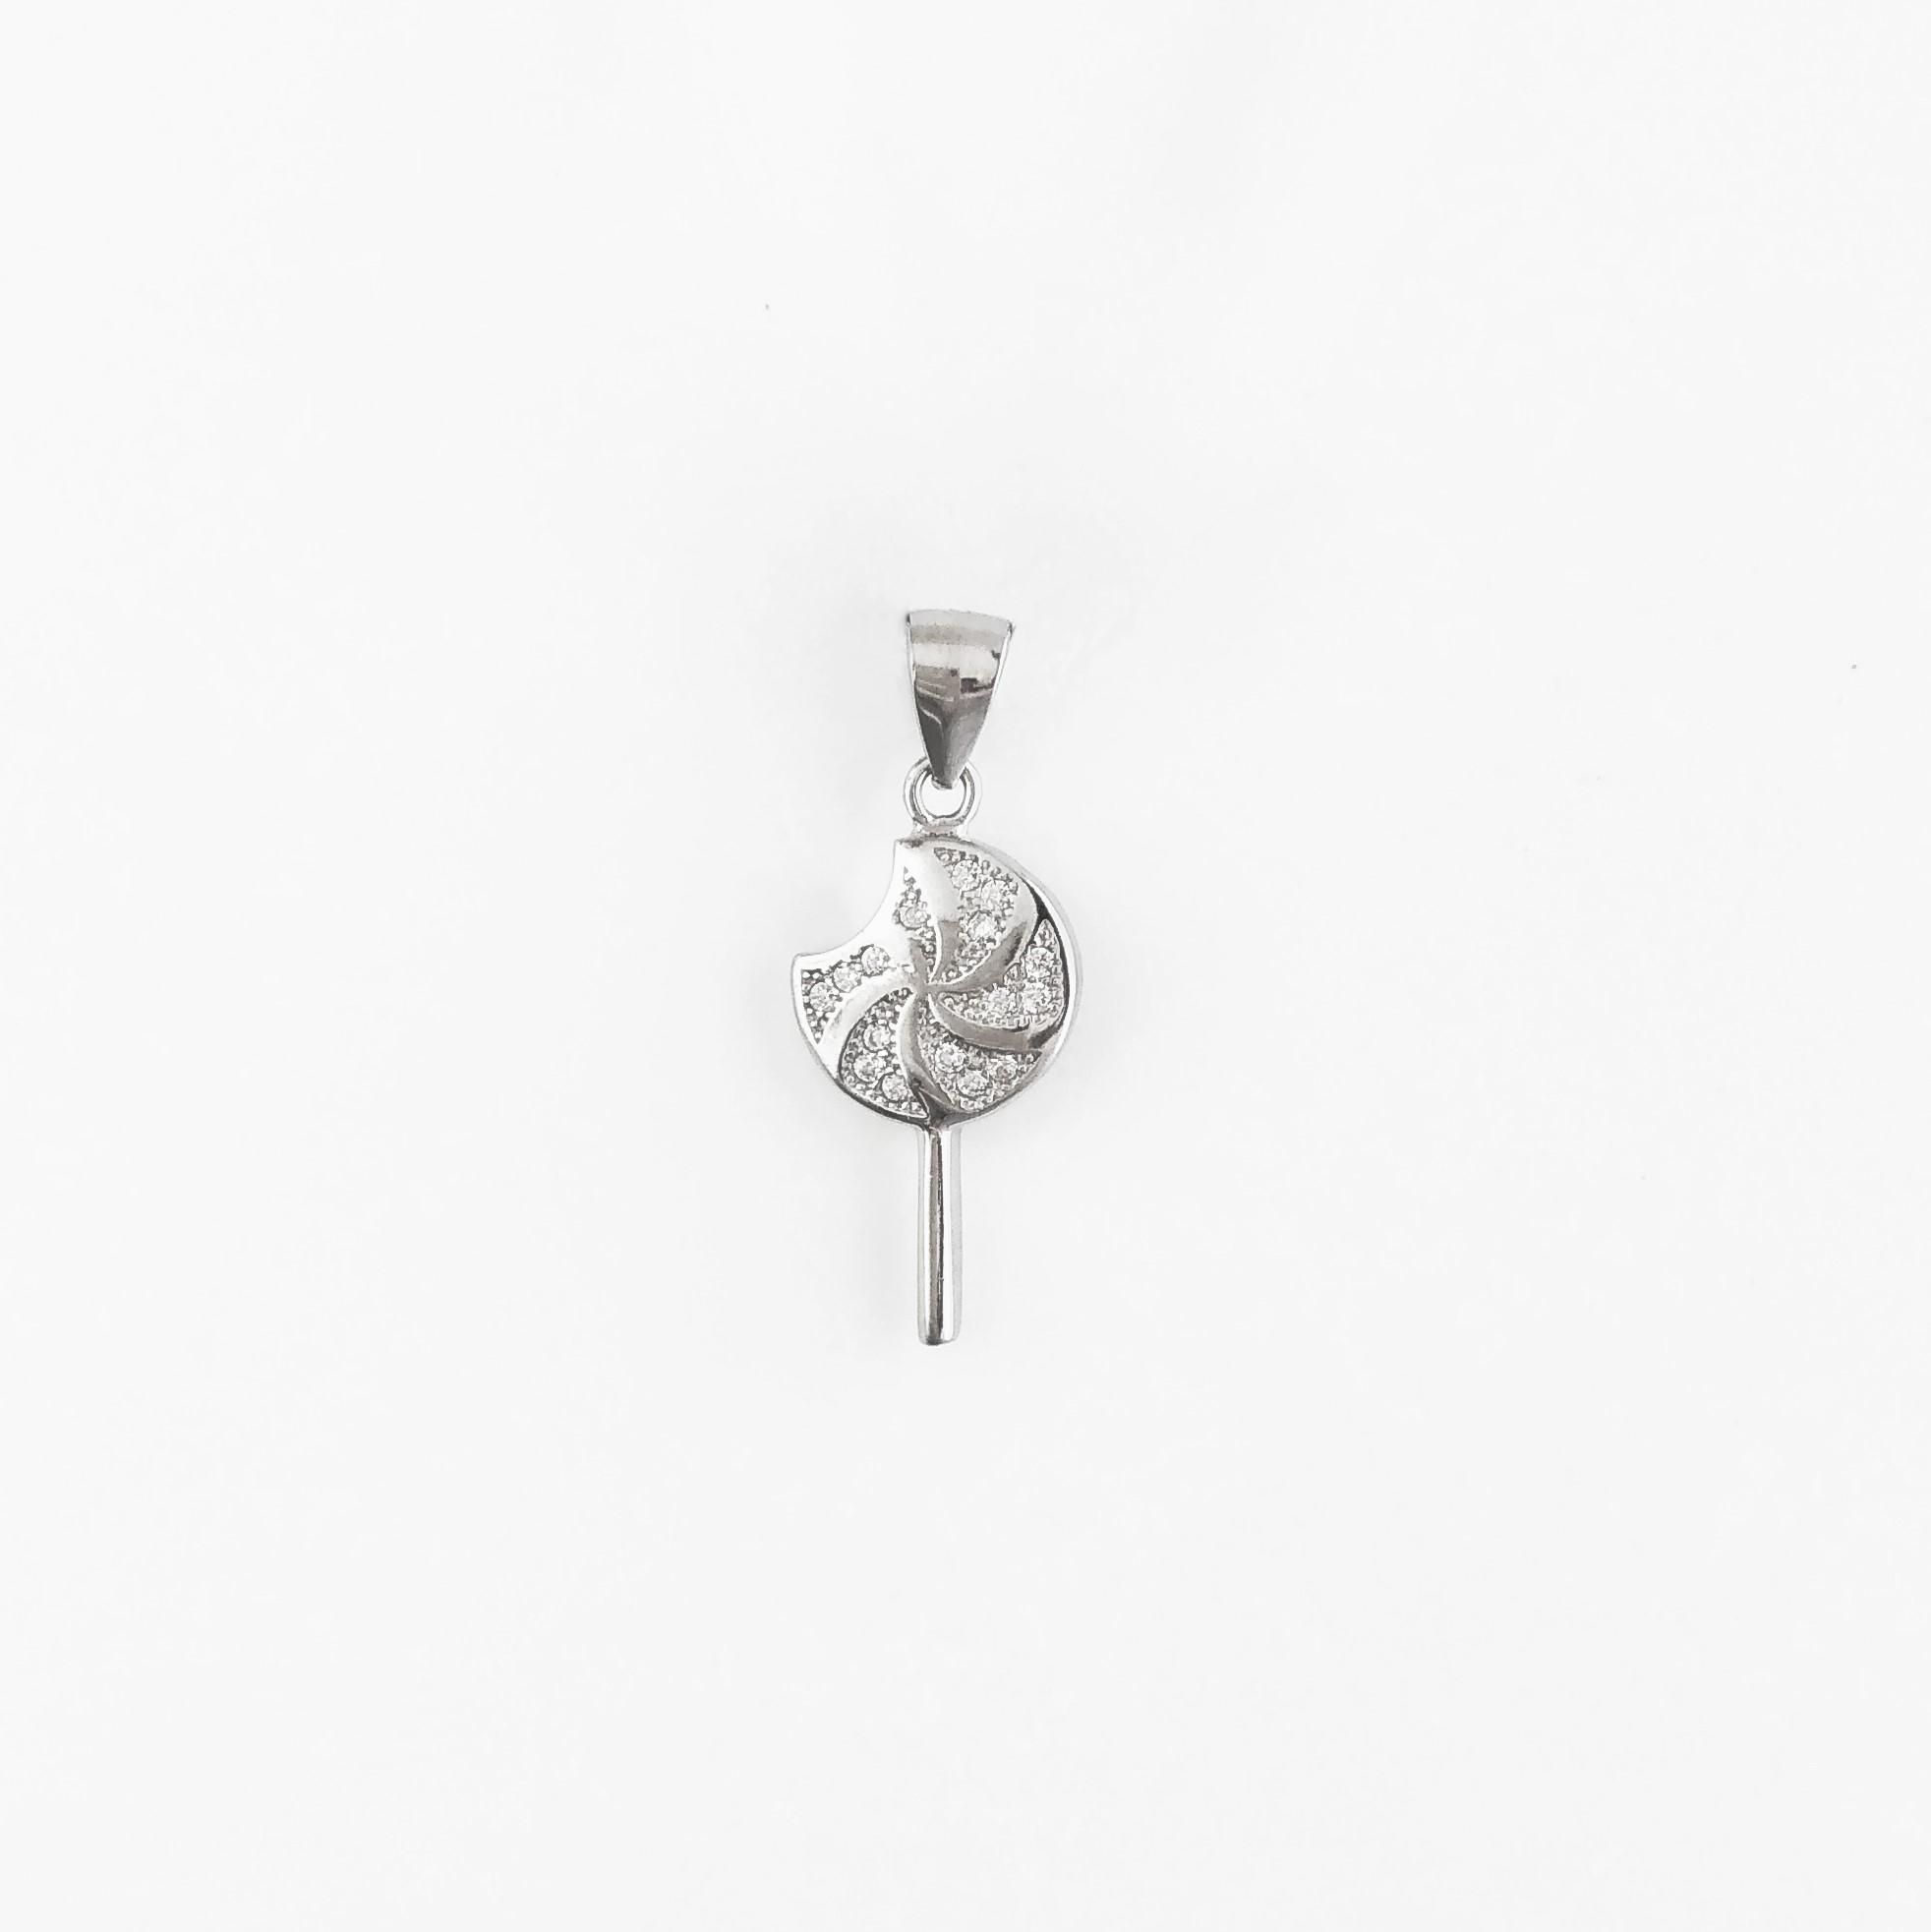 Swirl Candy Silver Pendant